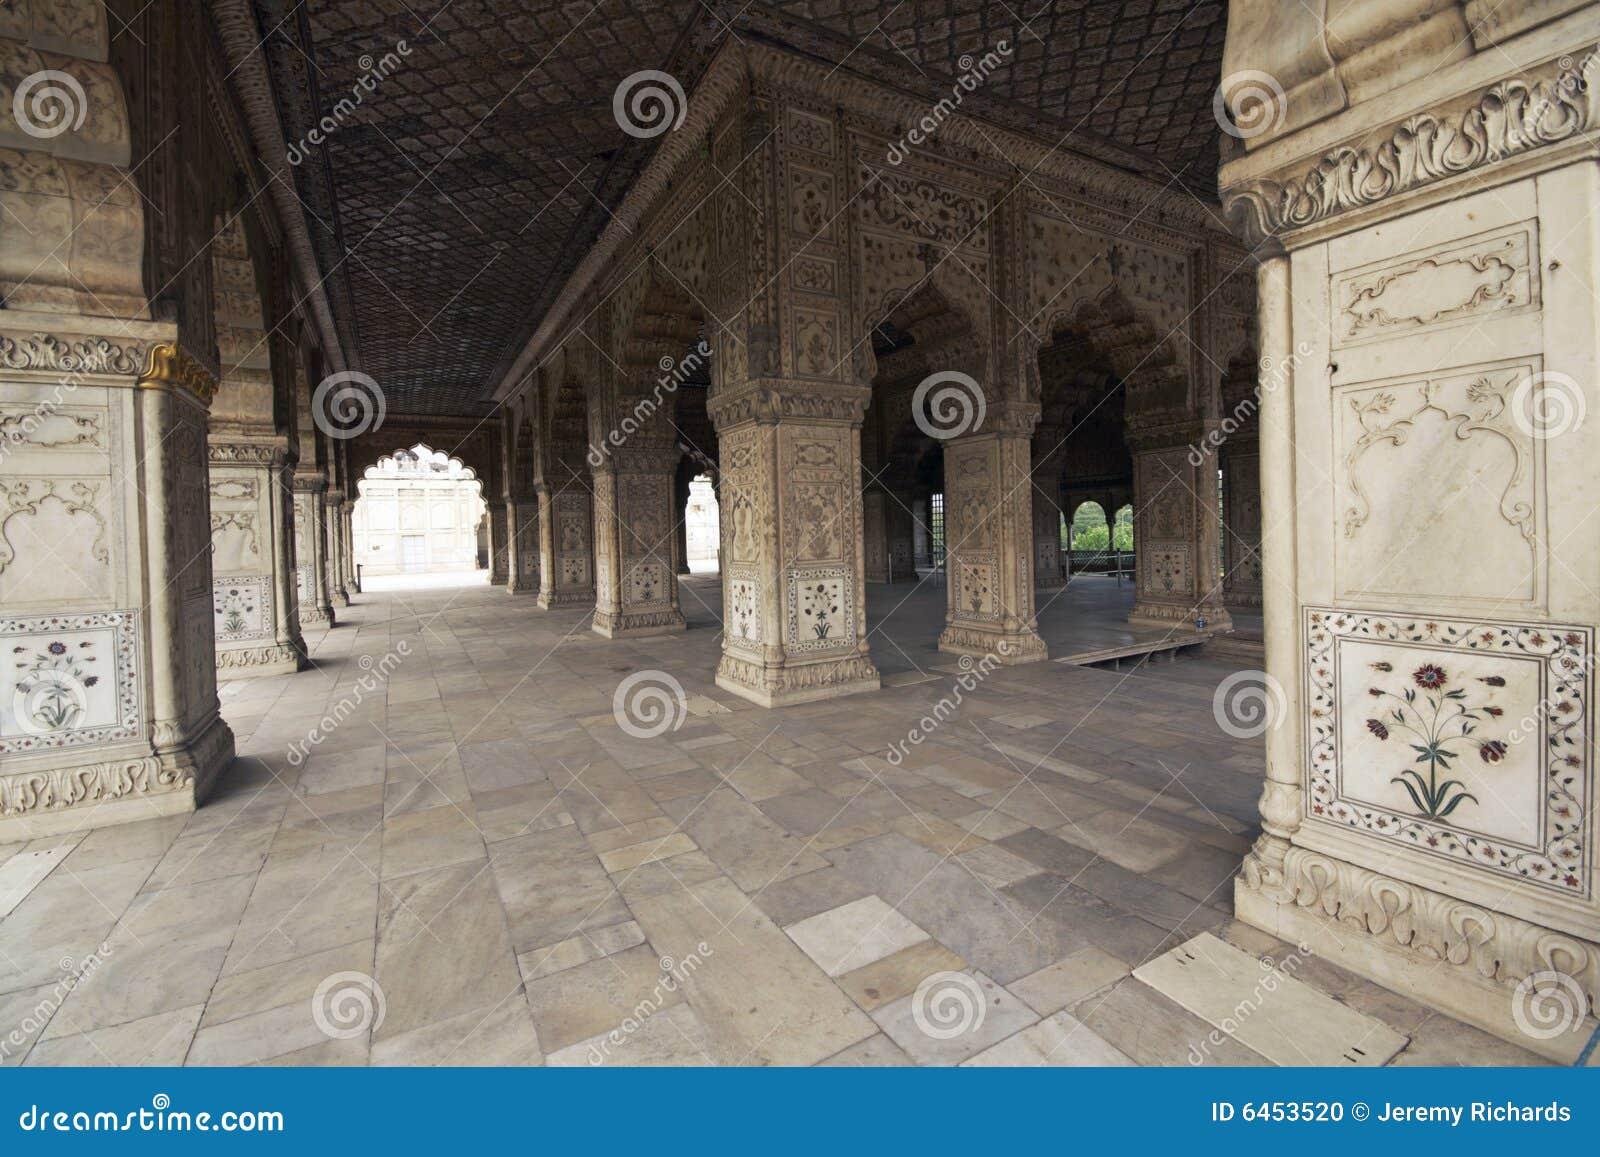 Islamic Pavilion